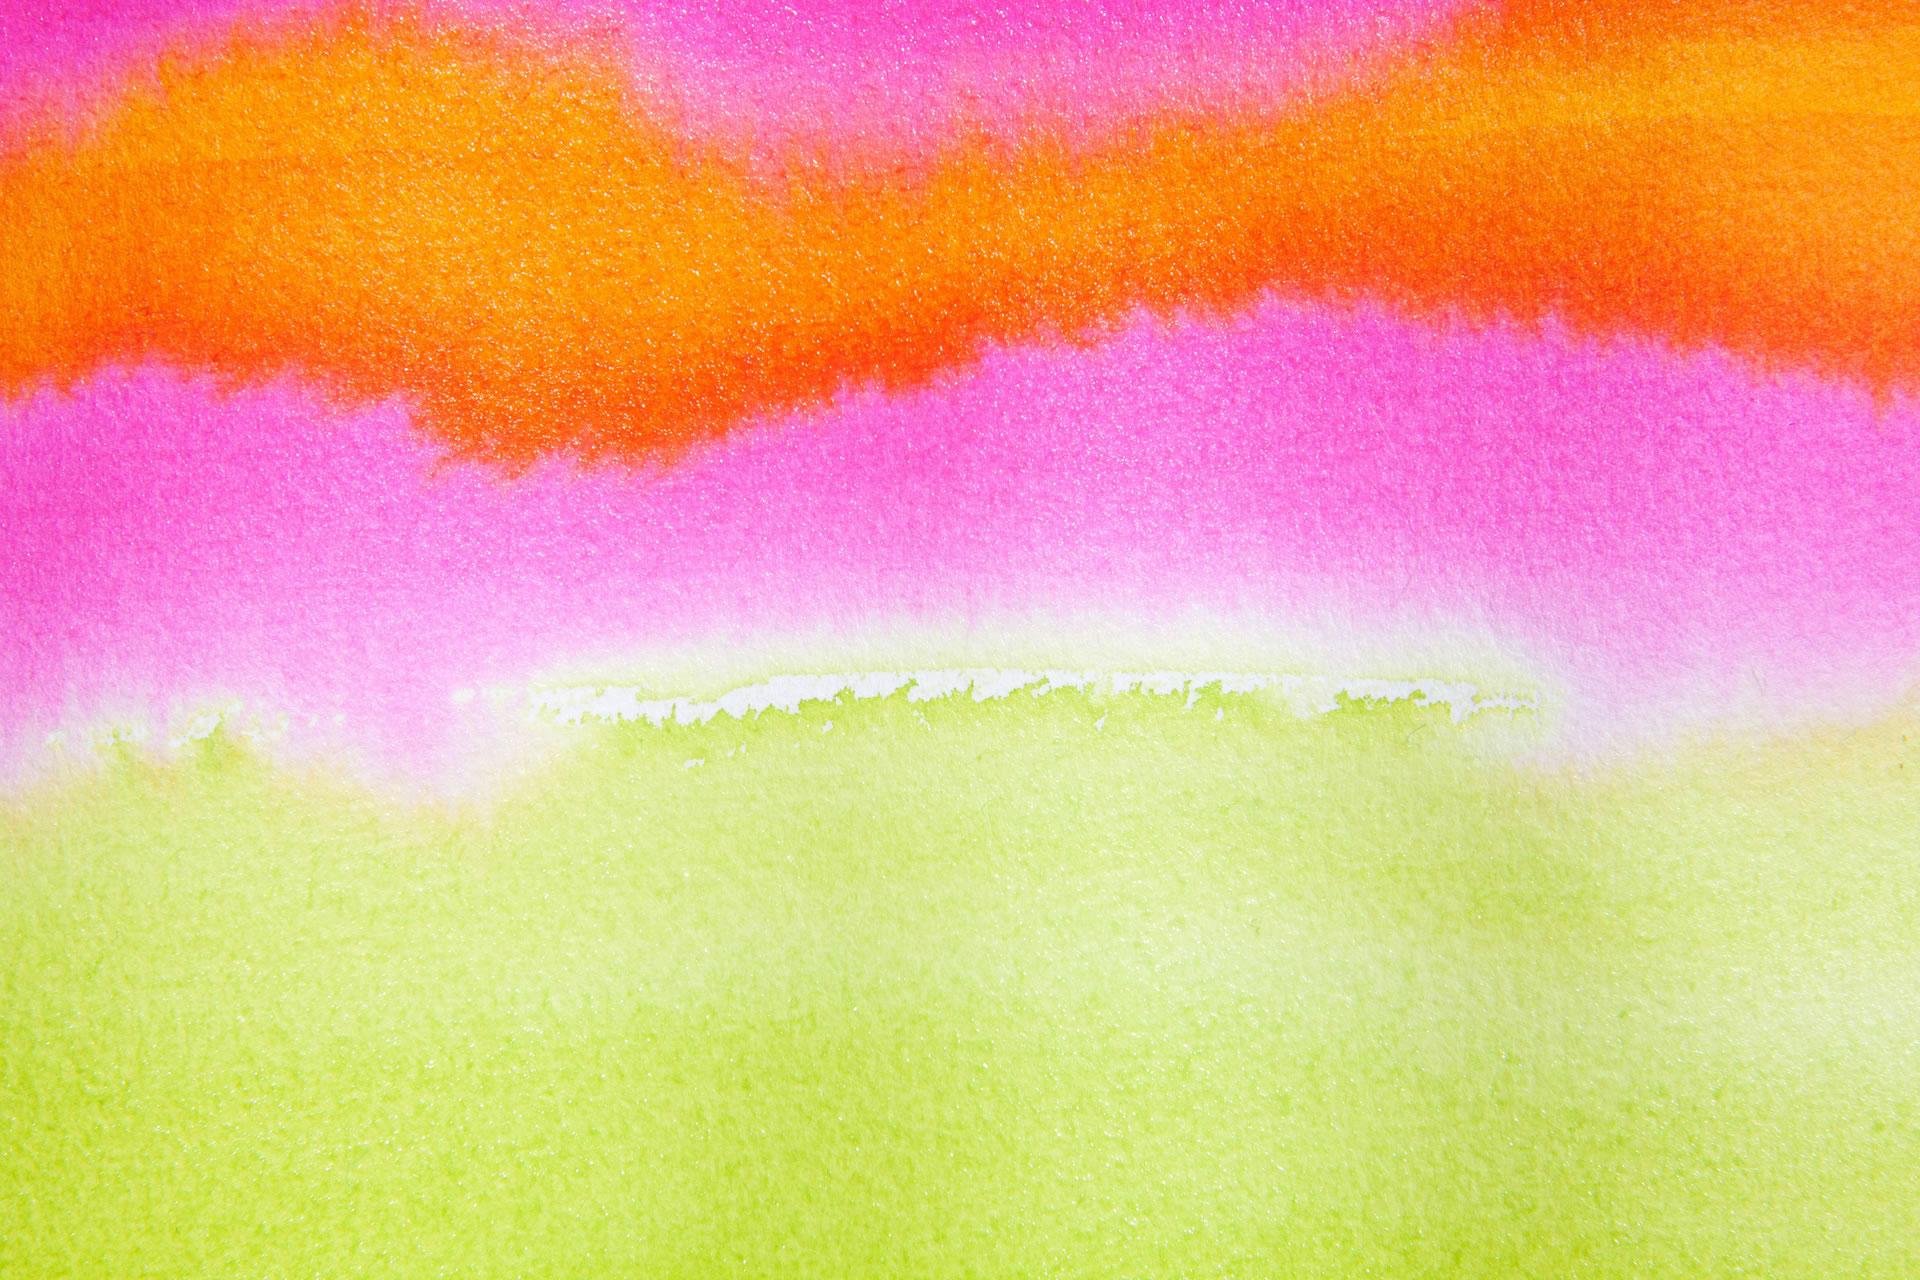 download wallpaper-abstract-6 wallpaper